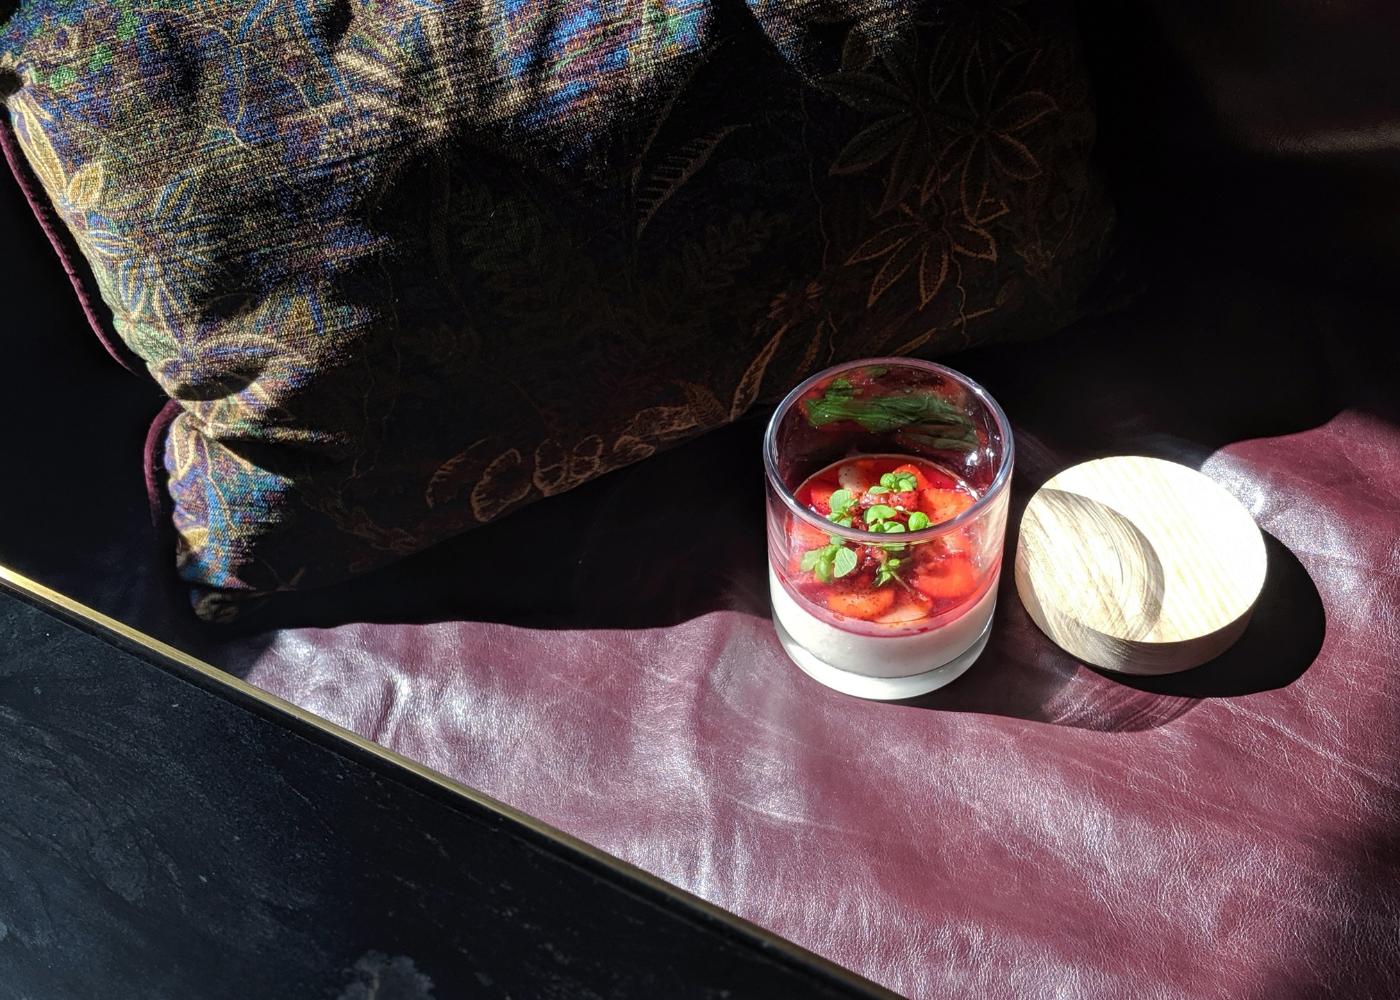 Atlas' panna cotta with strawberry